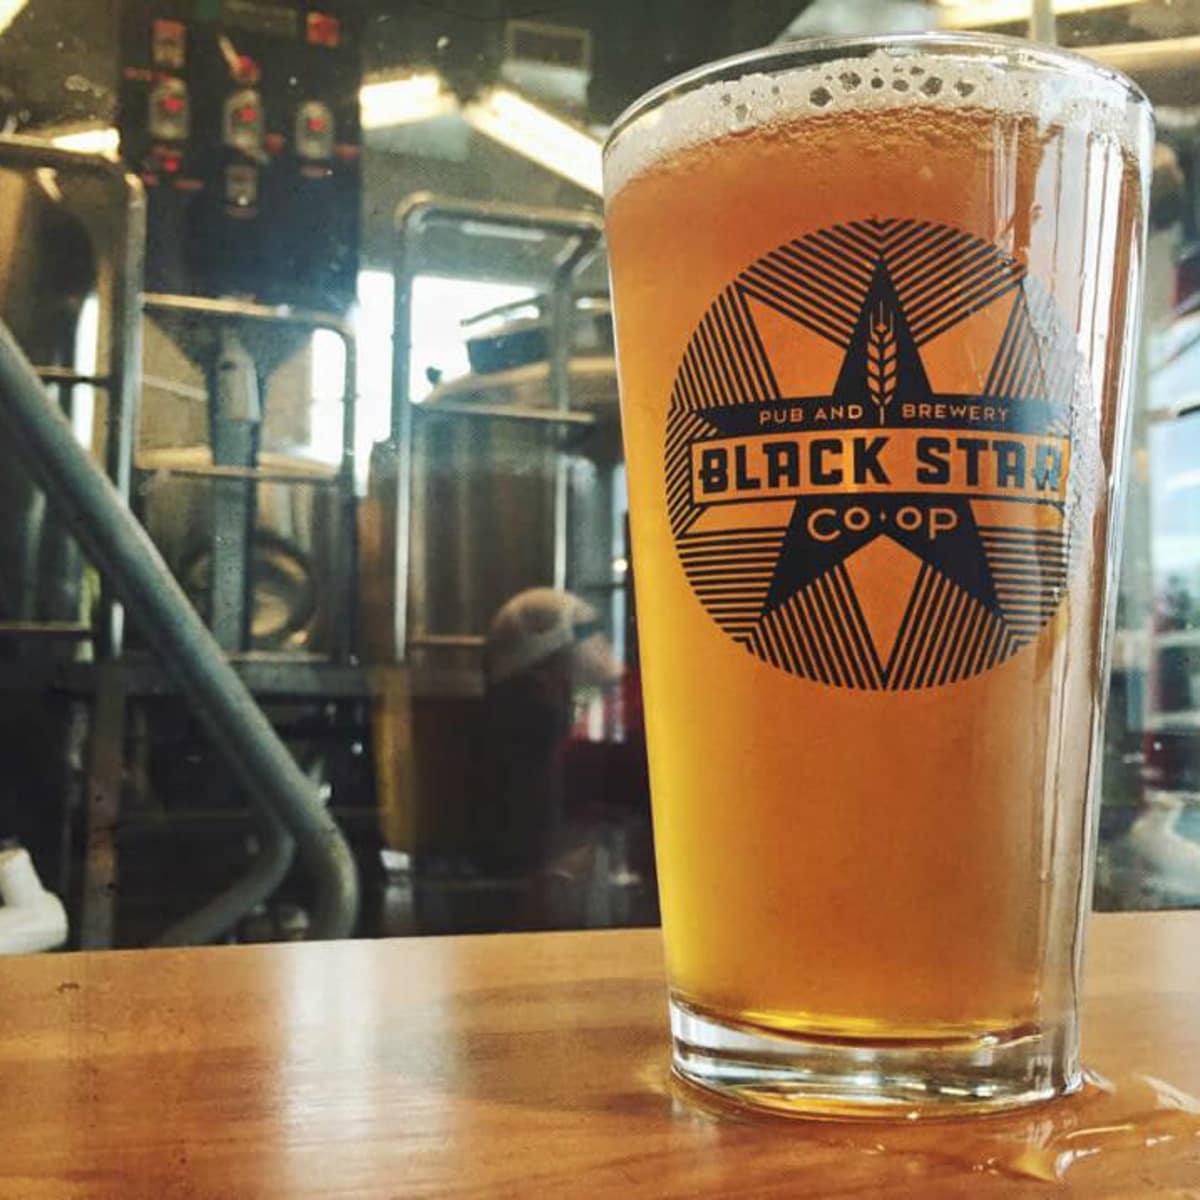 Black Star Co-op brewery pub Austin restaurant beer bar 2015